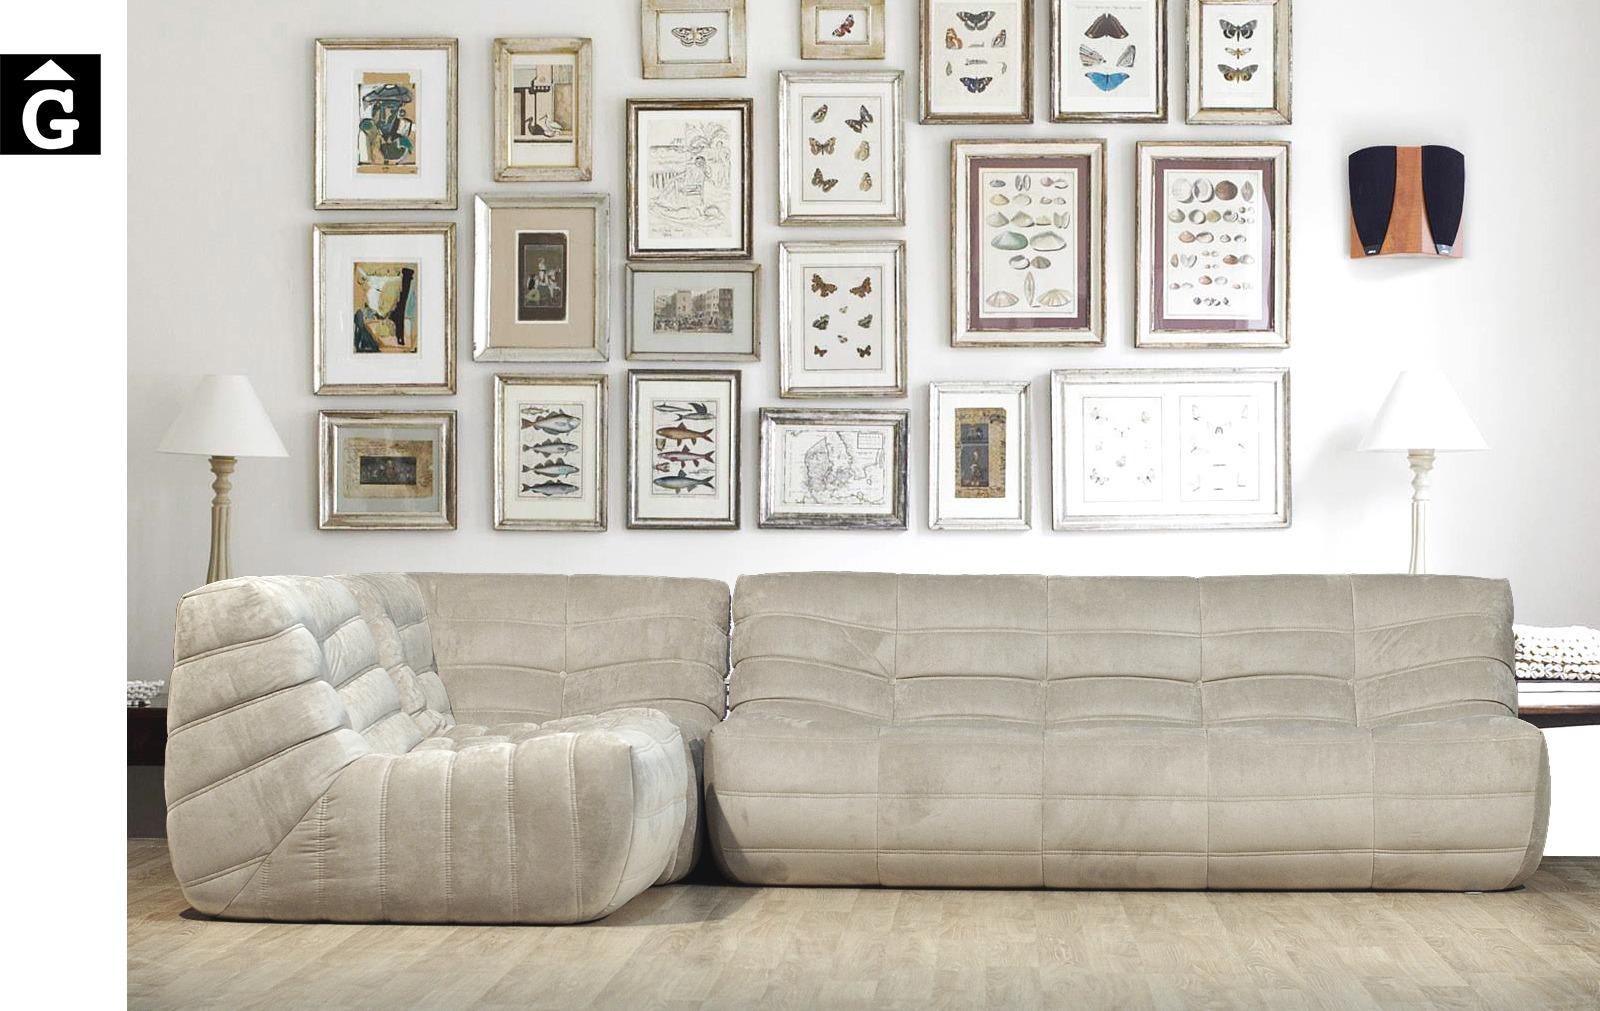 Sofà raconer Oruga beige | Atemporal | Ethical home interiors | Gifreu | sofas | Girona